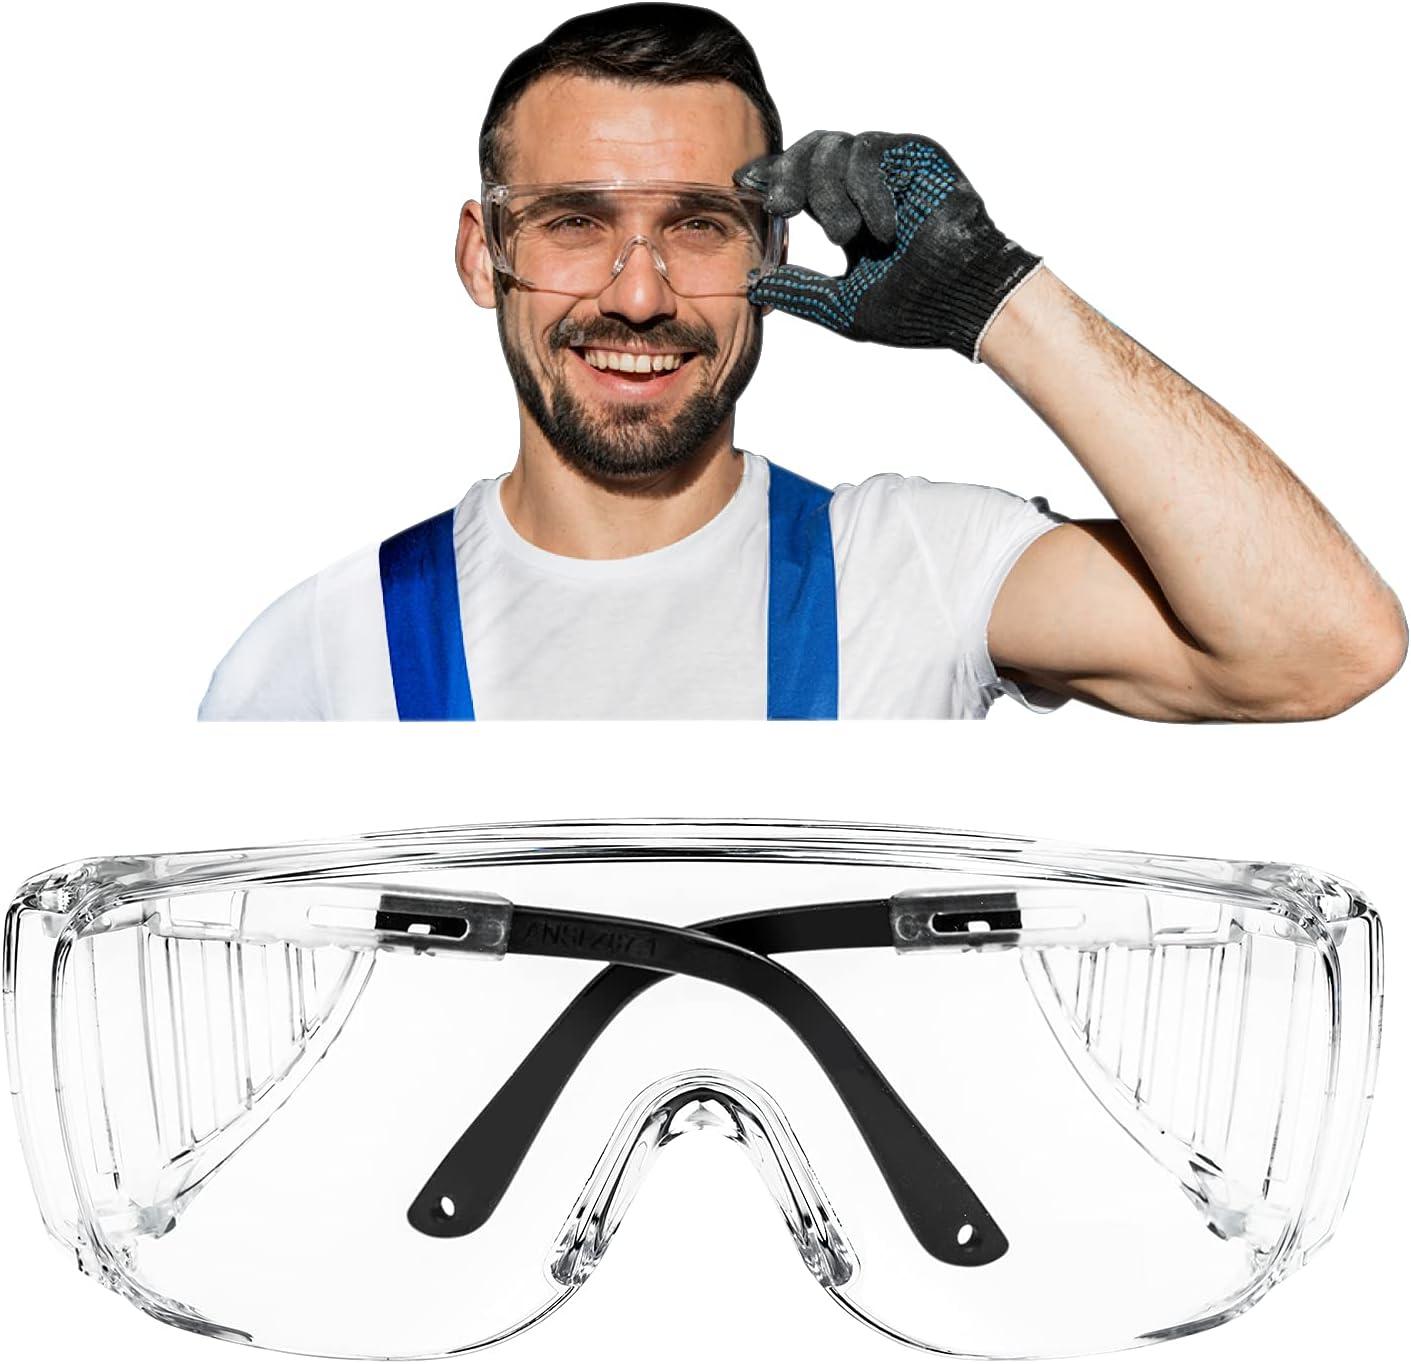 B.ANGEL New item Anti-Fog Safety Glasses shopping Protec Adjustable Eyewear Temple